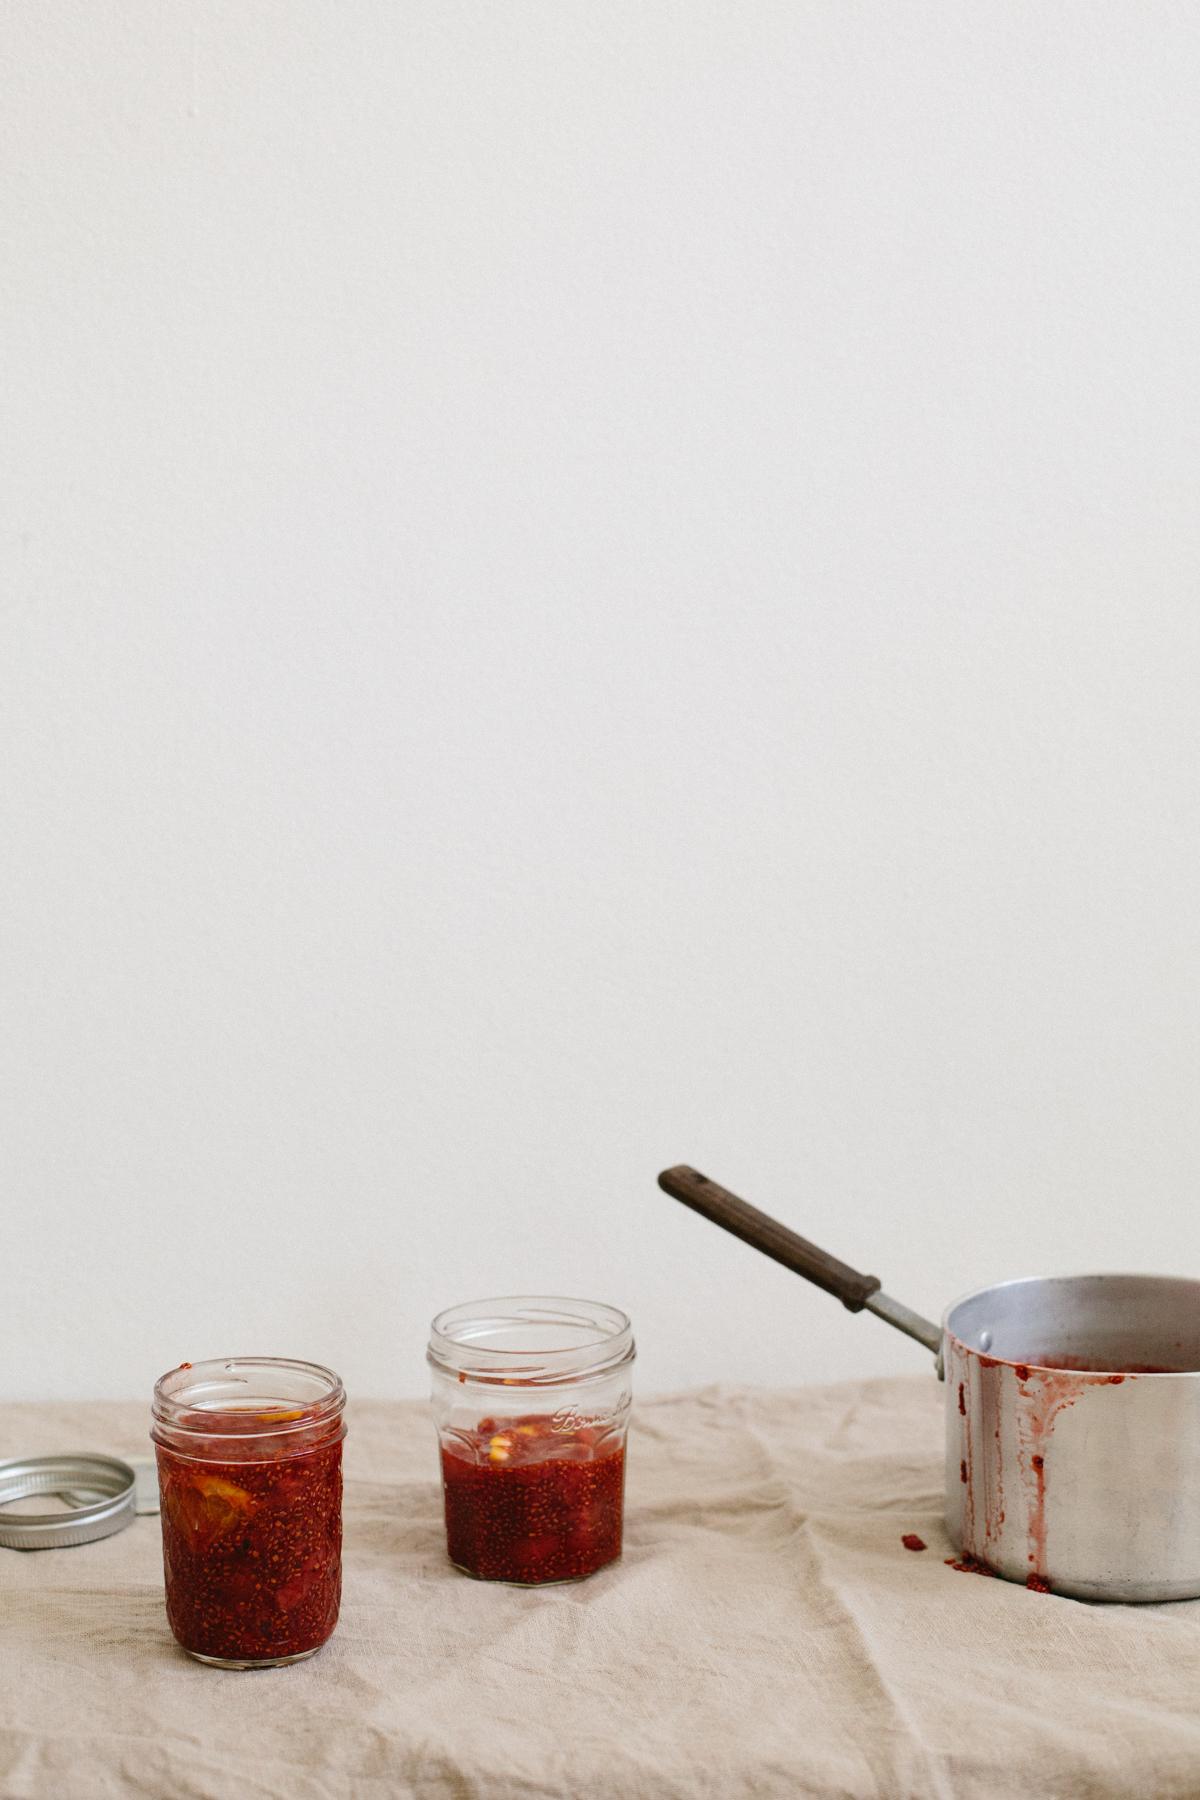 Strawberry + Blood Orange Chia Jam | Erika Rax